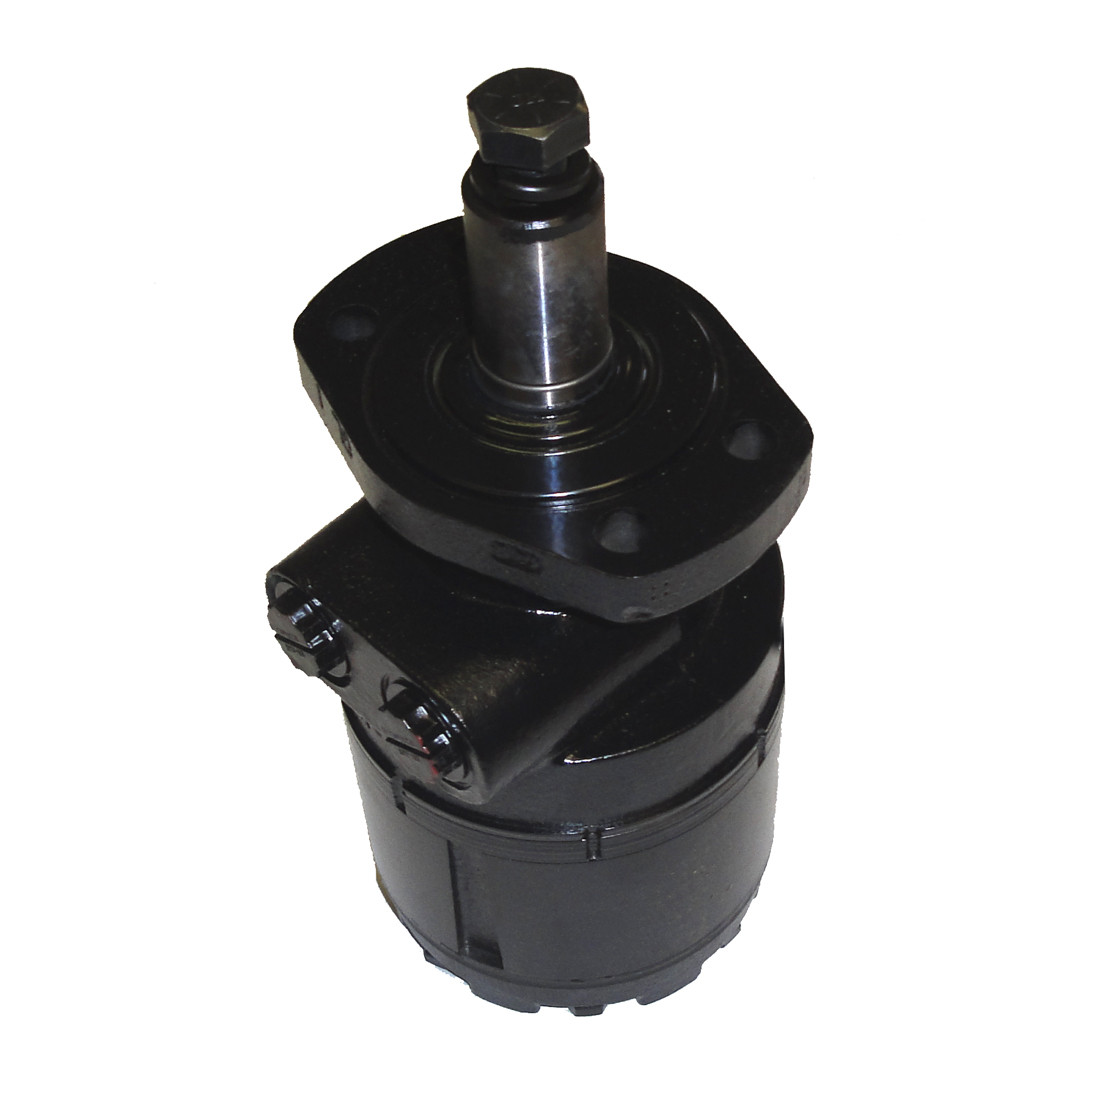 Hydre12 inmac kolstrand white re12 hydraulic motor for White hydraulic motor parts